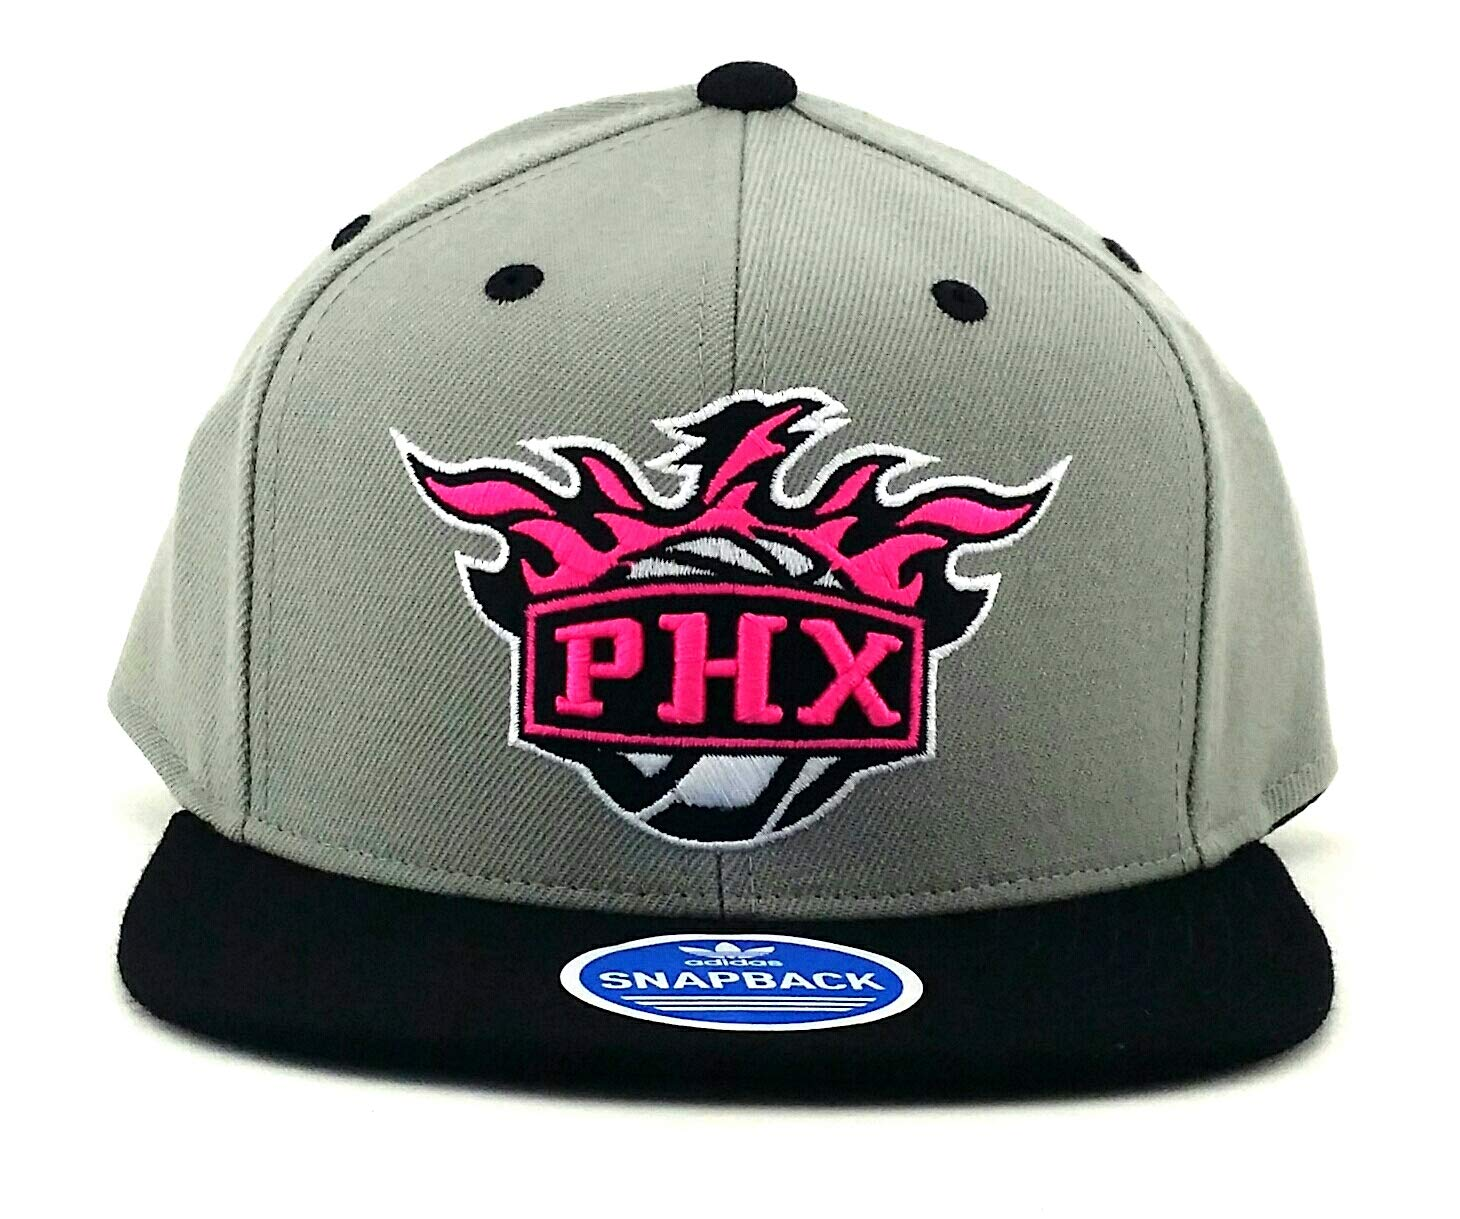 83d081dc3 Amazon.com : adidas Phoenix Suns New PHX NBA Neon New Vibe Gray Pink ...